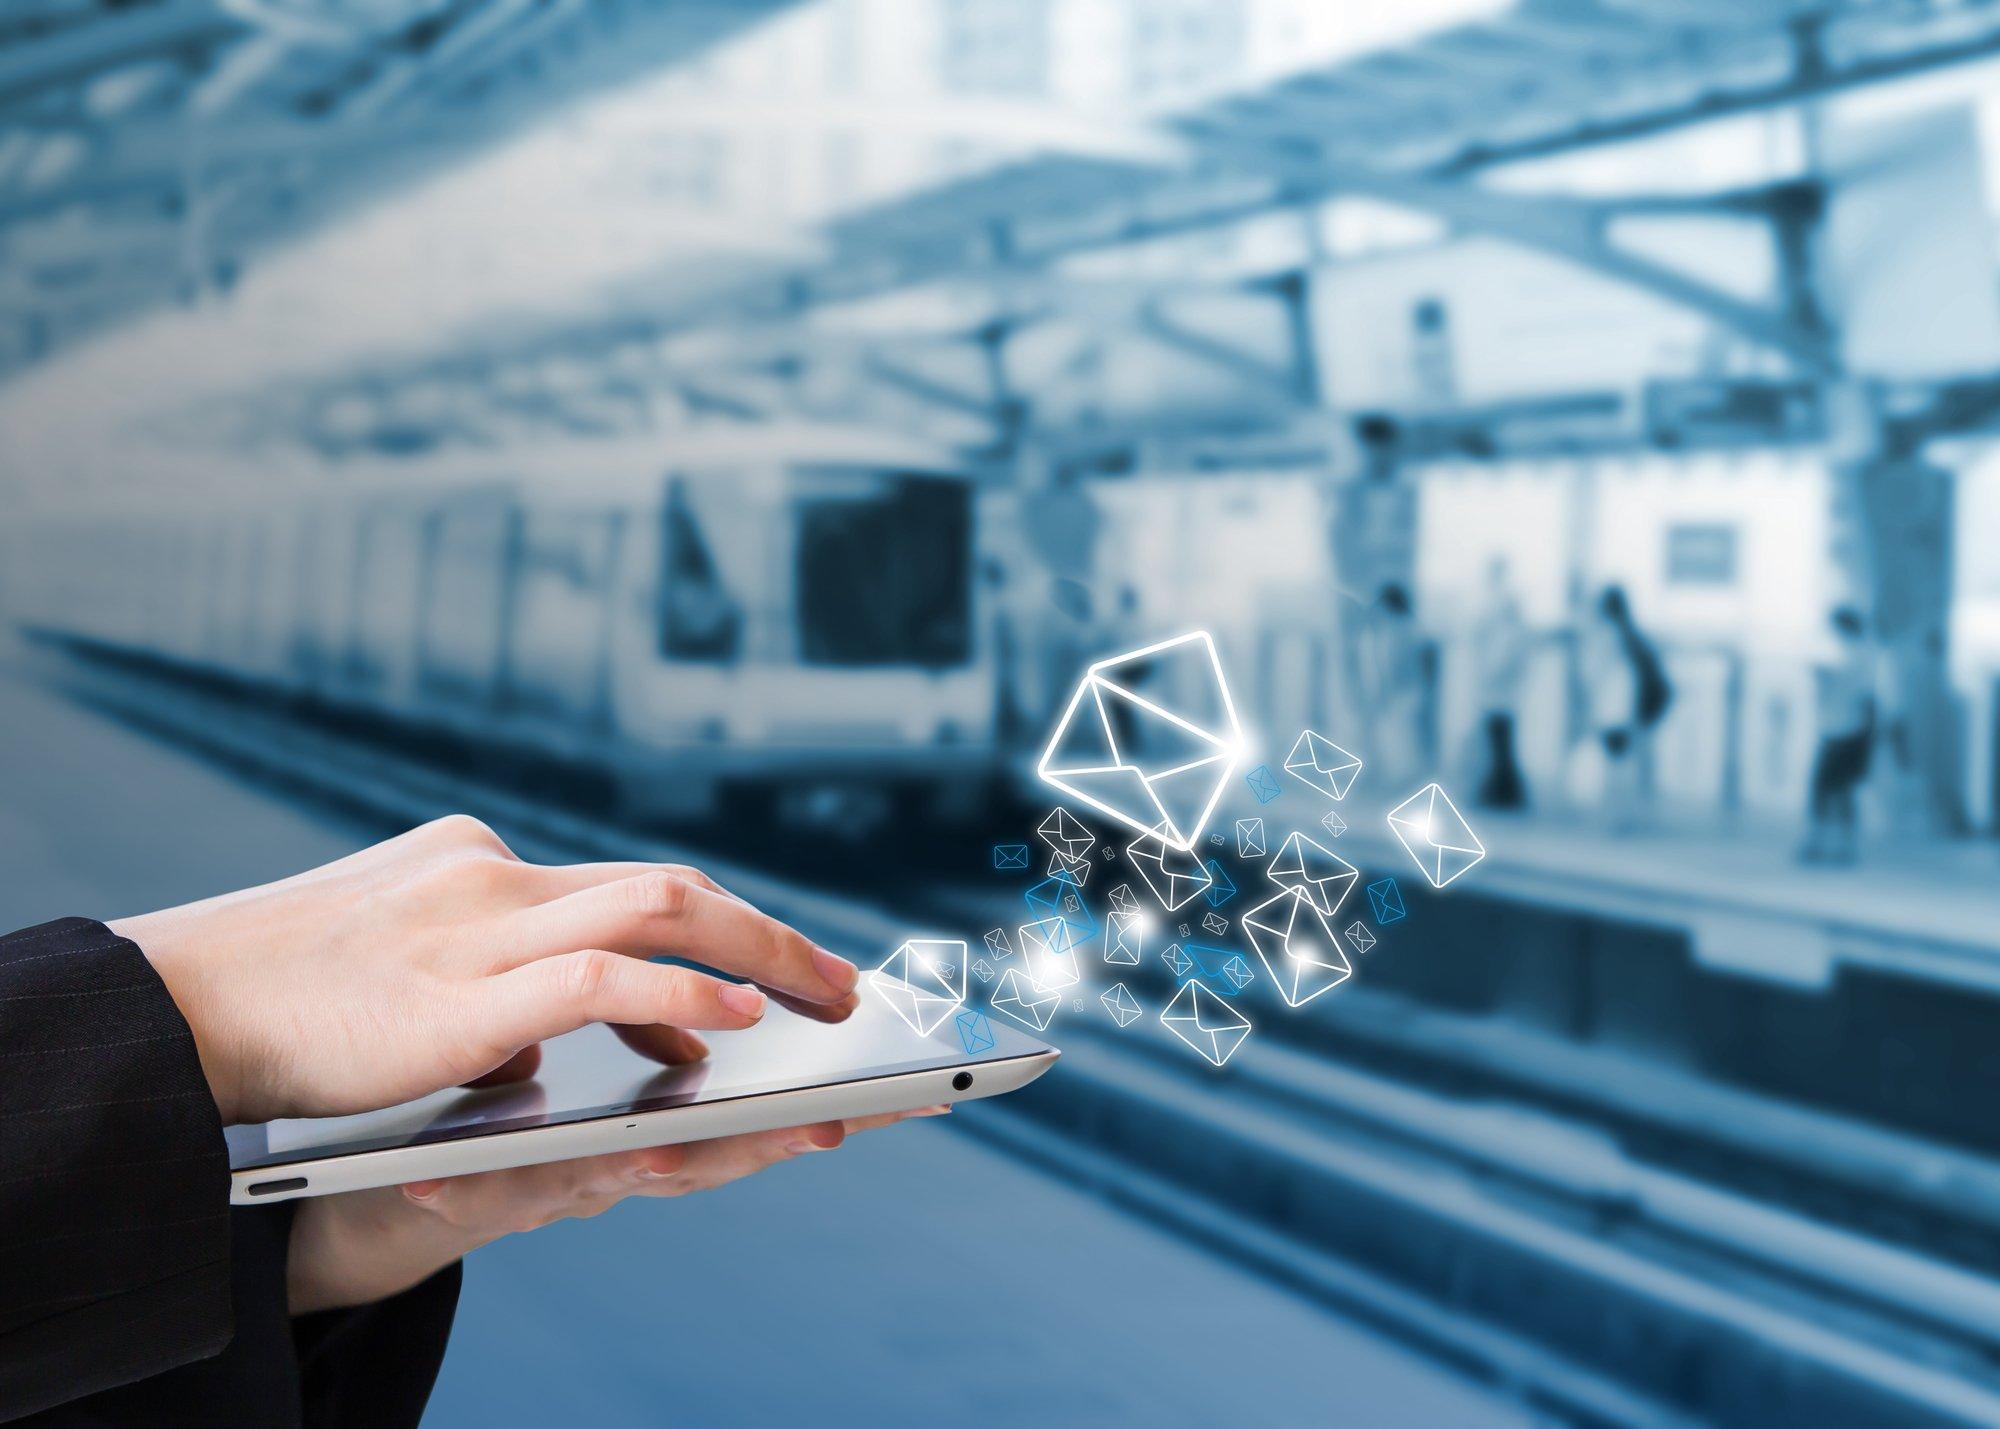 E-mail Marketing Services from OneCom Media & Marketing